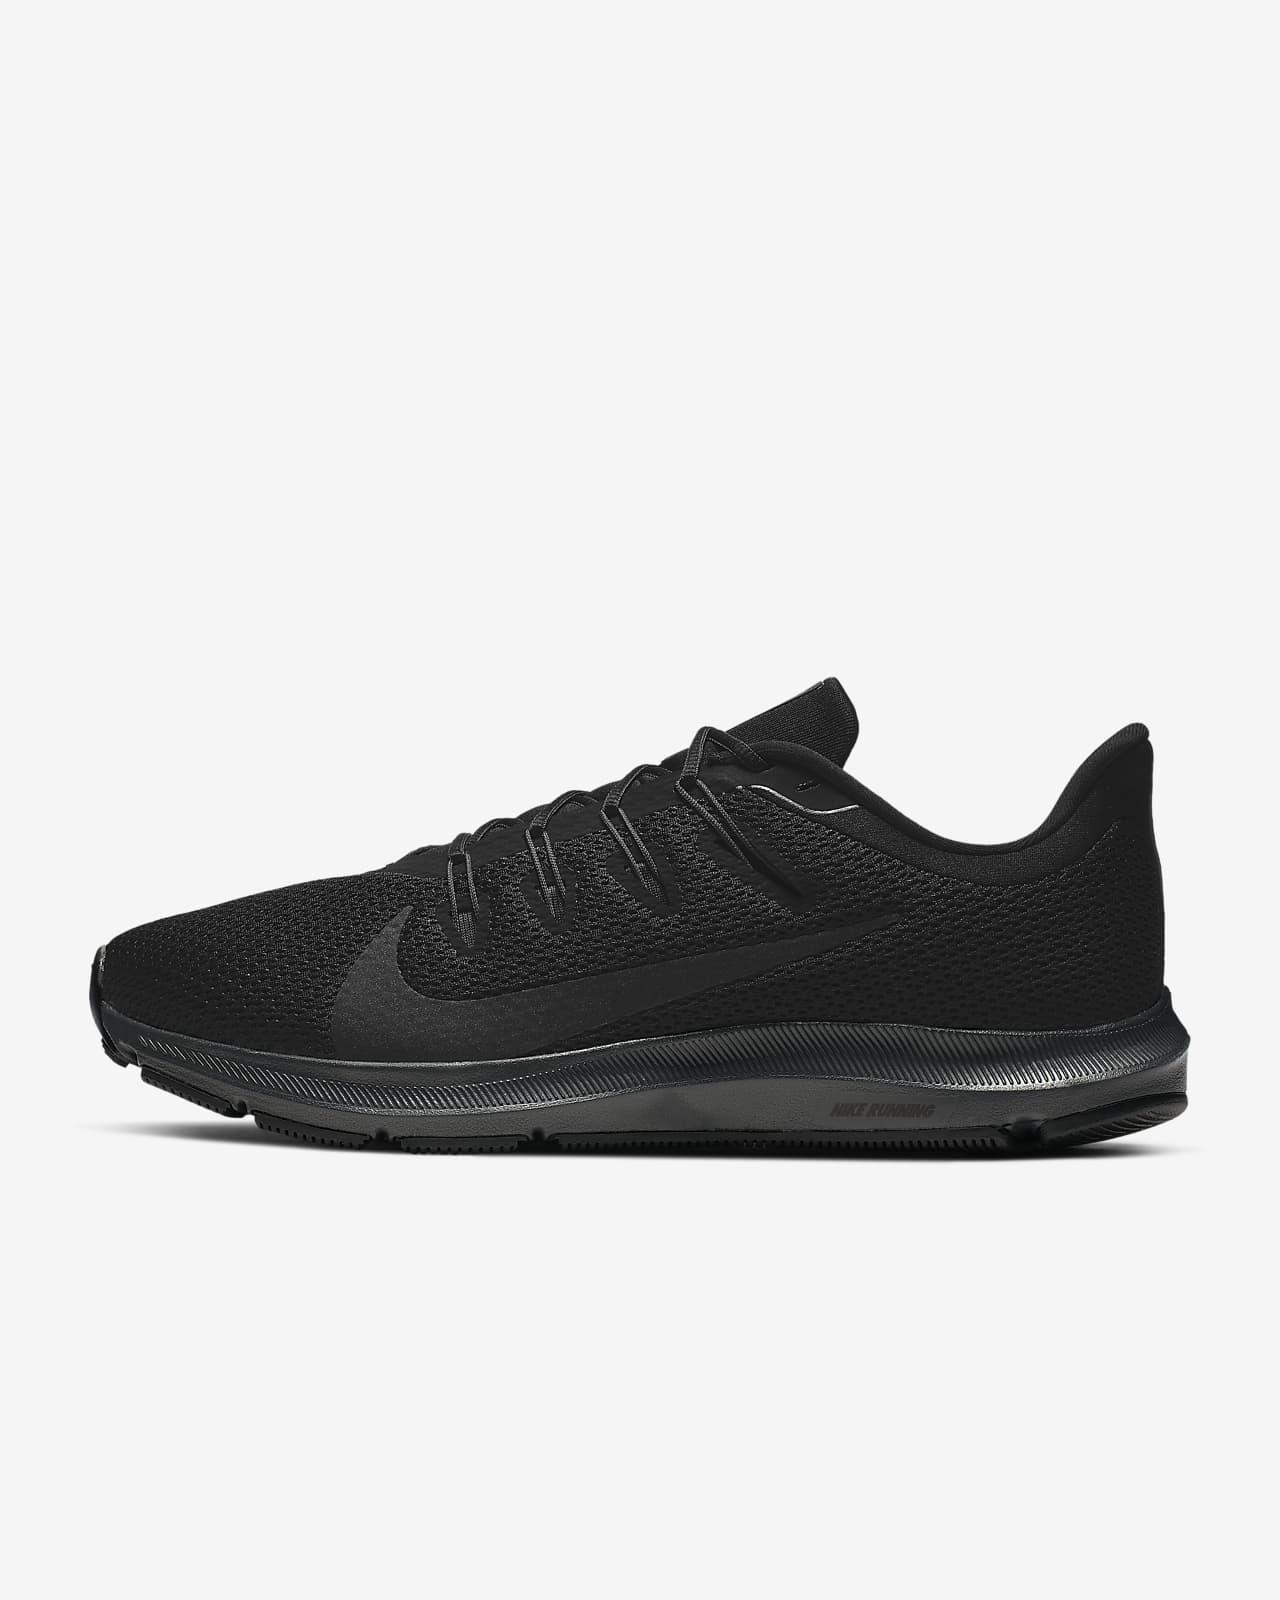 Nike Quest 2 Men's Running Shoe. Nike NL